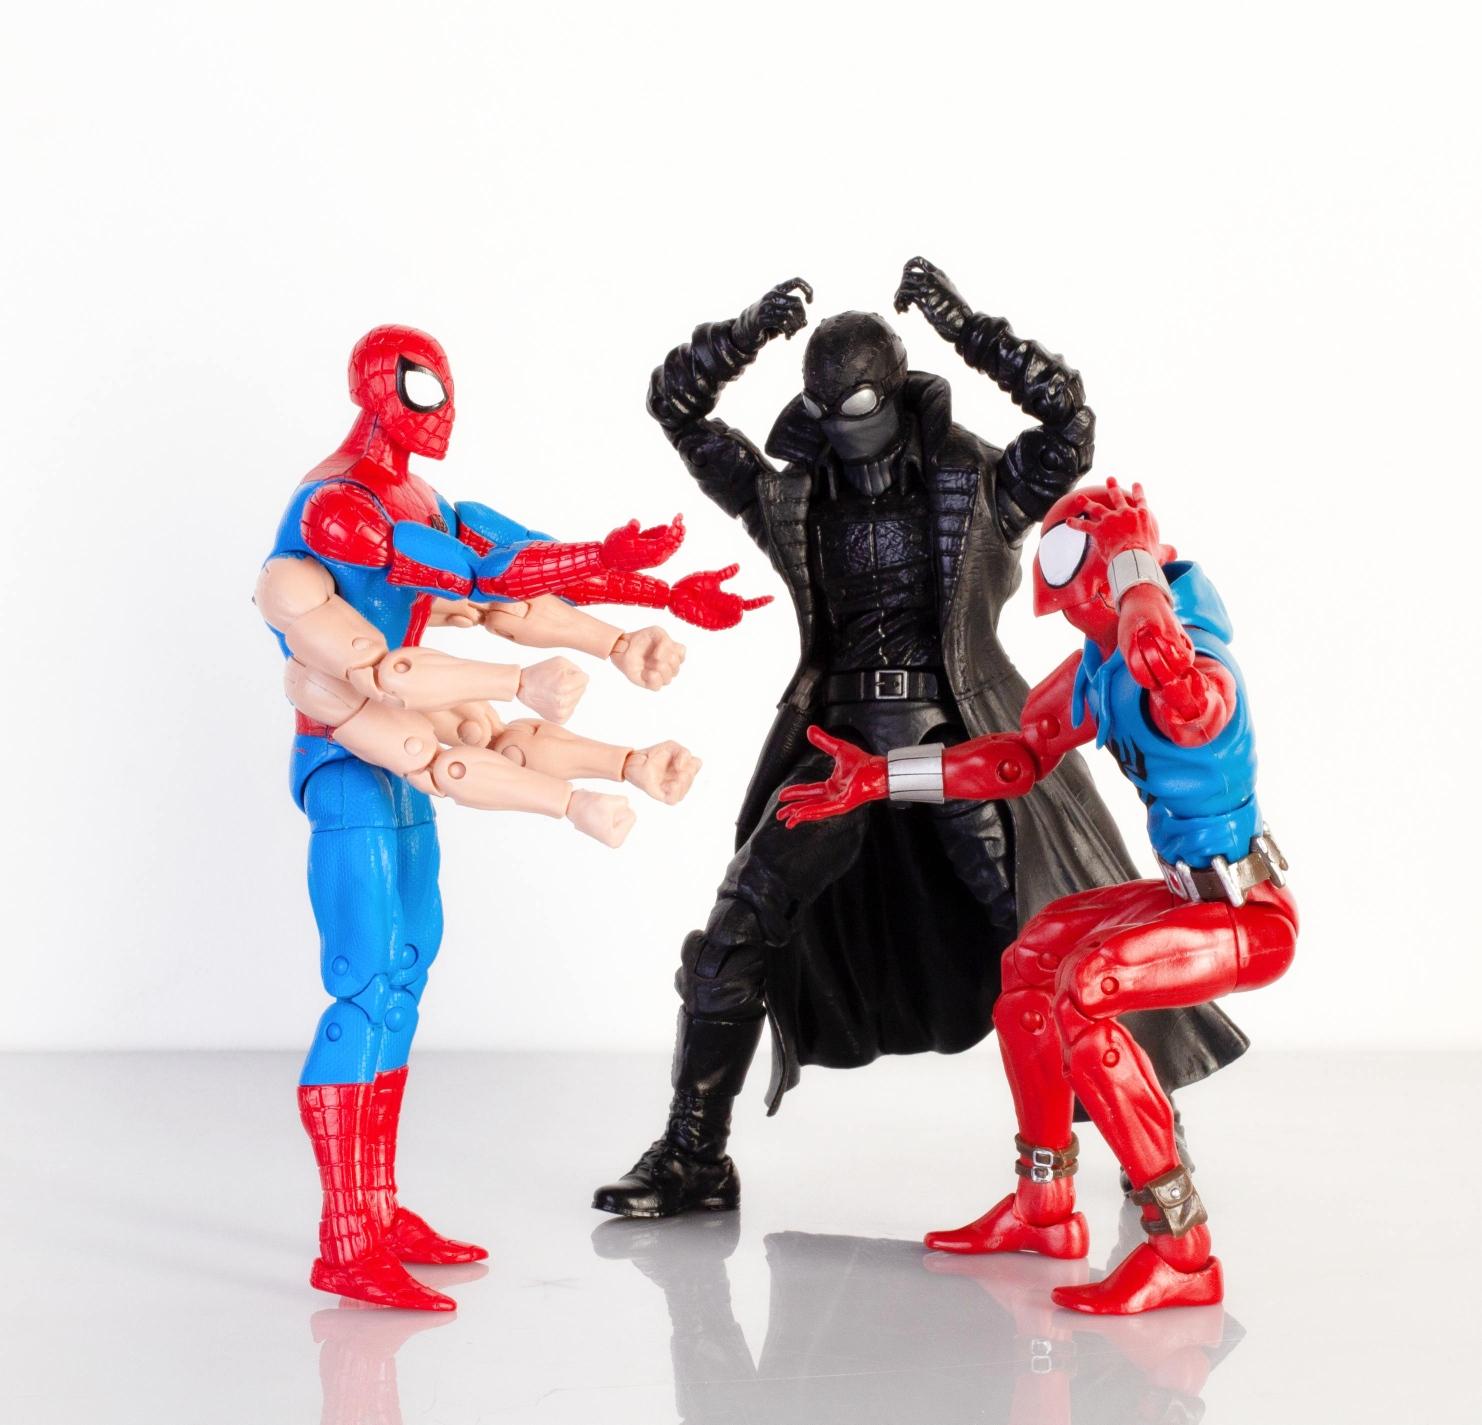 Marvel Legends Sixarms Spiderman vs. Marvel Legends Spiderman Nori i Marvel Legends Scarlet Spider